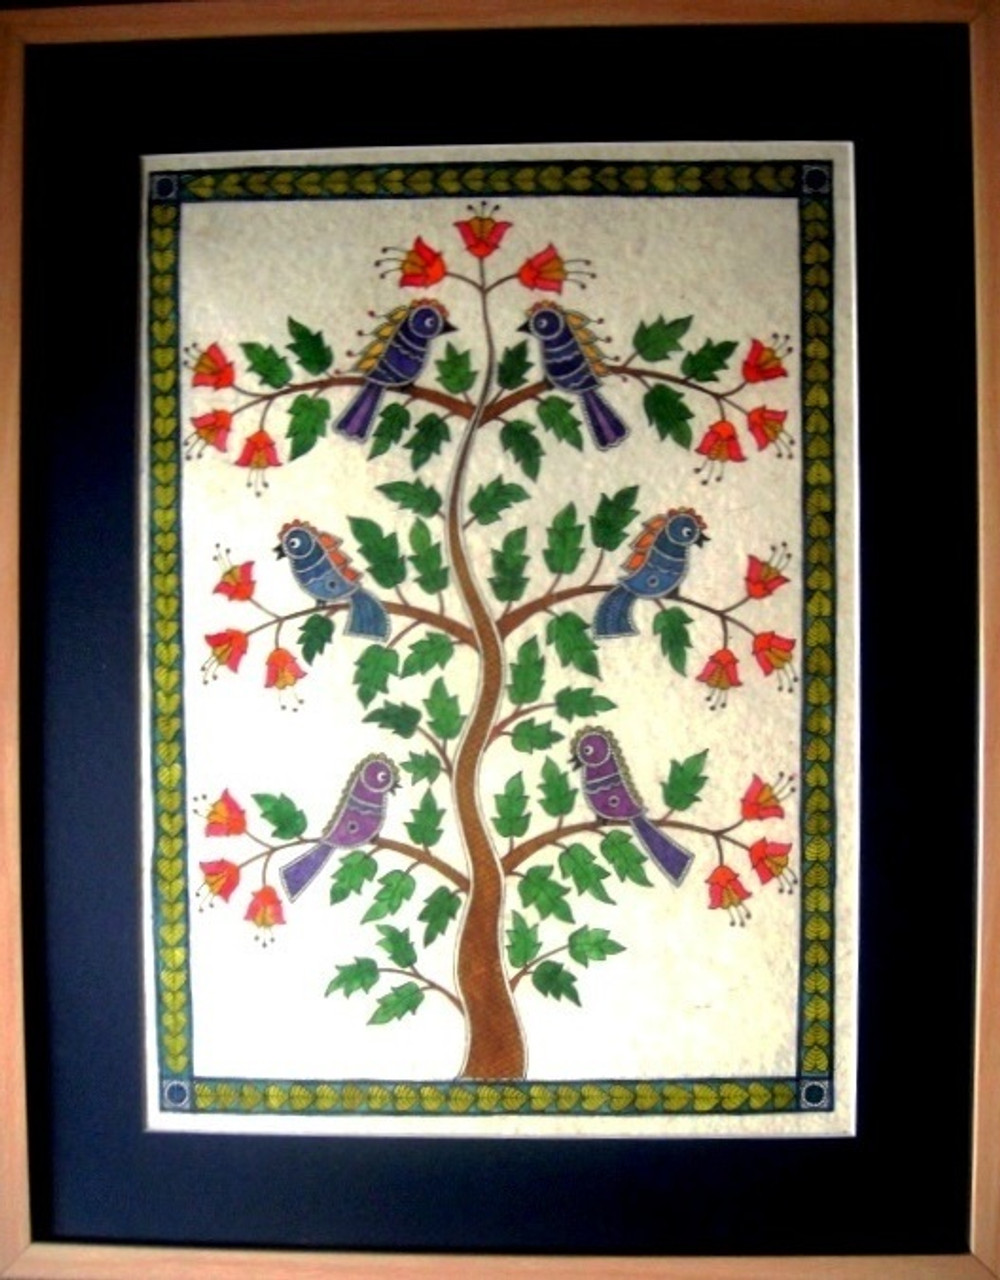 Chirping Tree - 15in X 19in (framed),ART_MASL4_1519,Ink ,Handmade ...